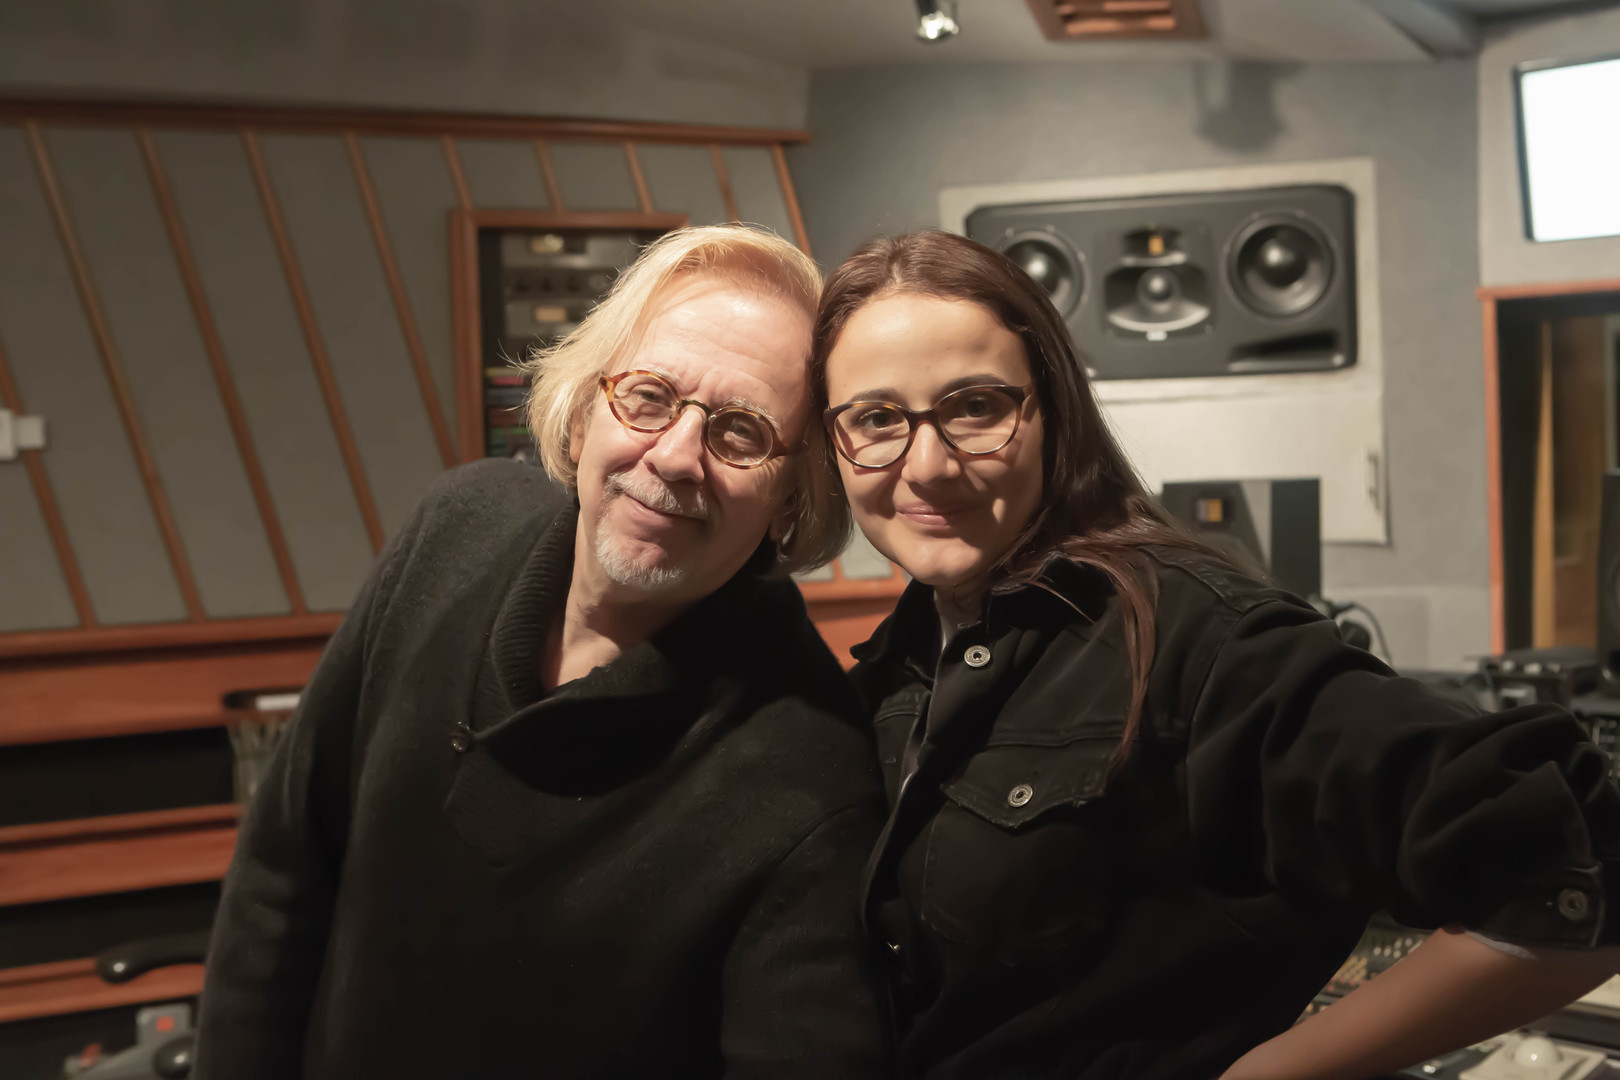 Mr Robert Cutarella and Melissa Salazar  at Eastside Sound Studio in New York city 2018